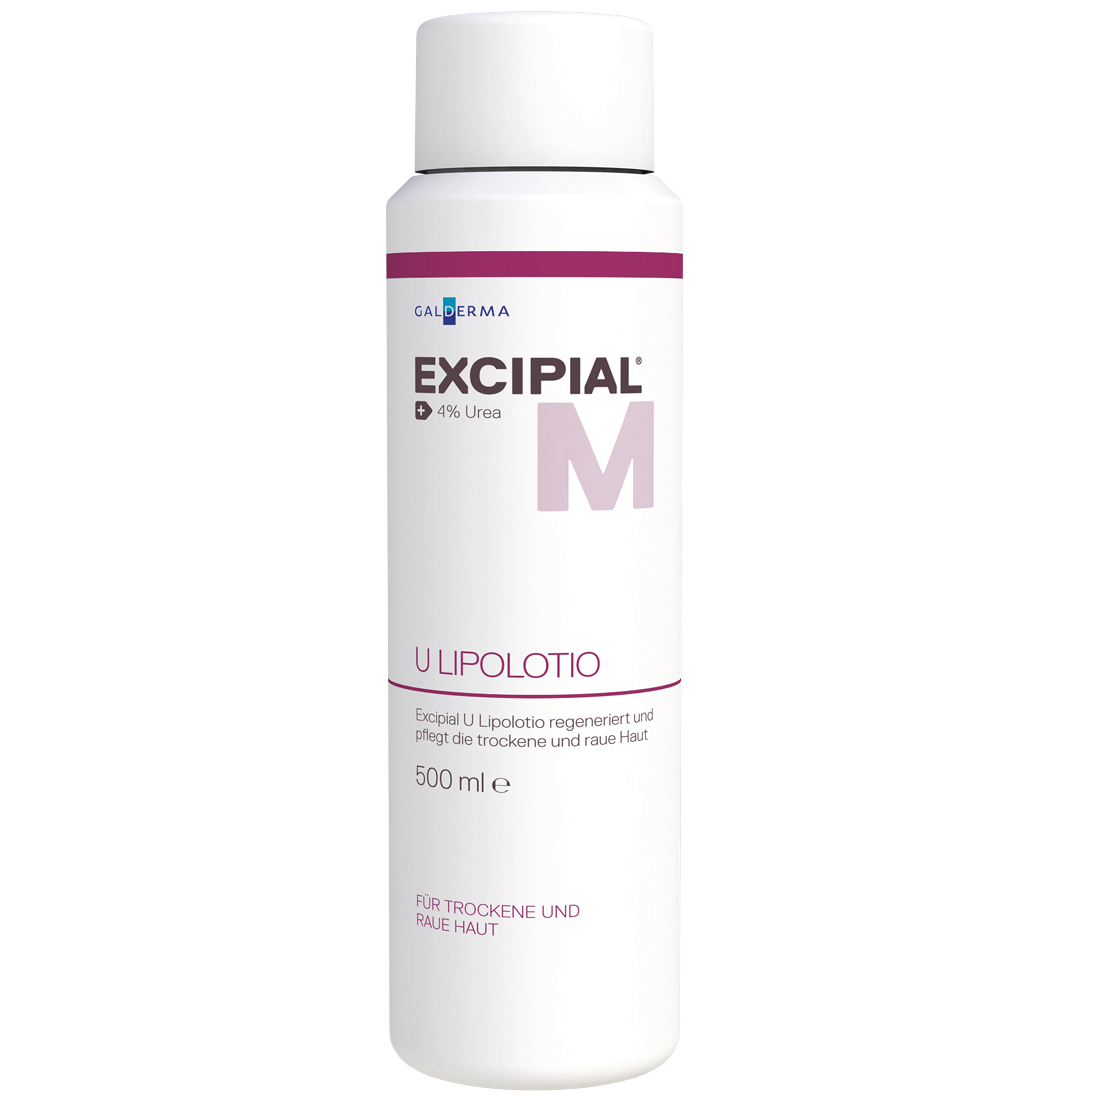 excipial__0001s_0005_G_NP_39L_EXC_U_HYDROLOTIO_500ml_D-F